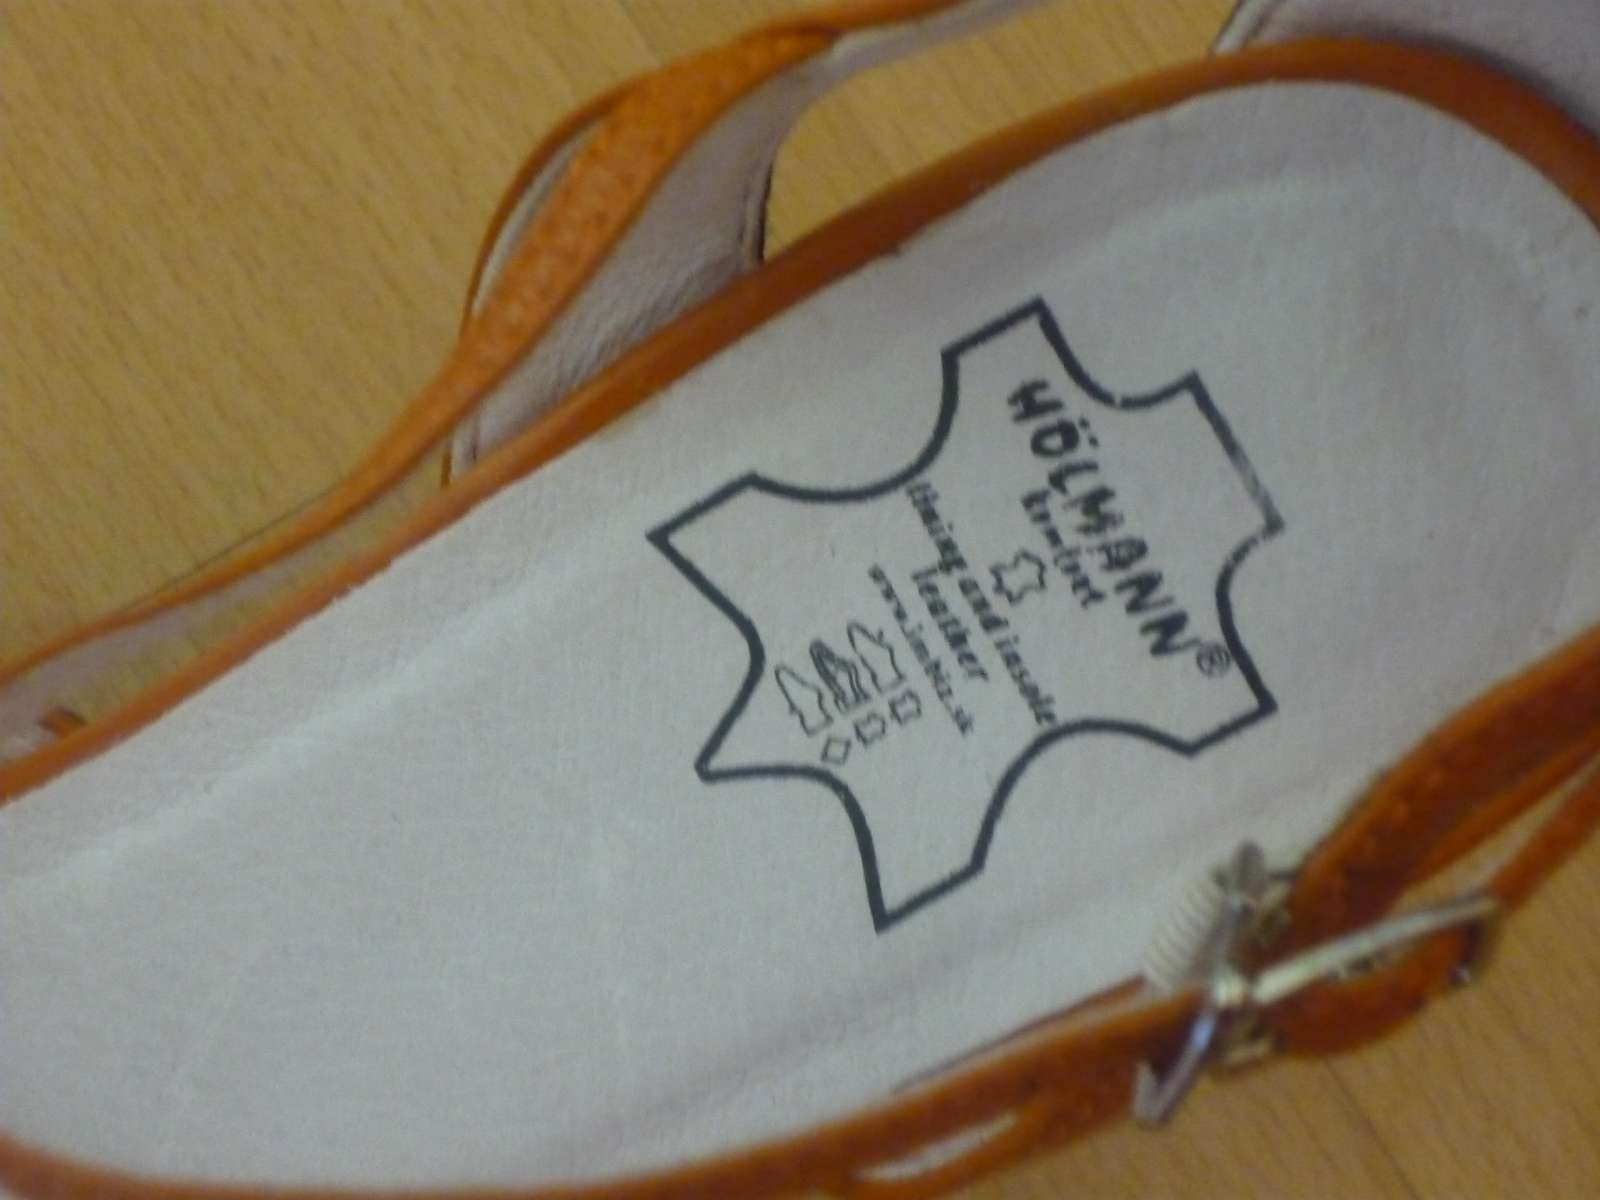 Kožené pohodlné topánočky - Obrázok č. 3